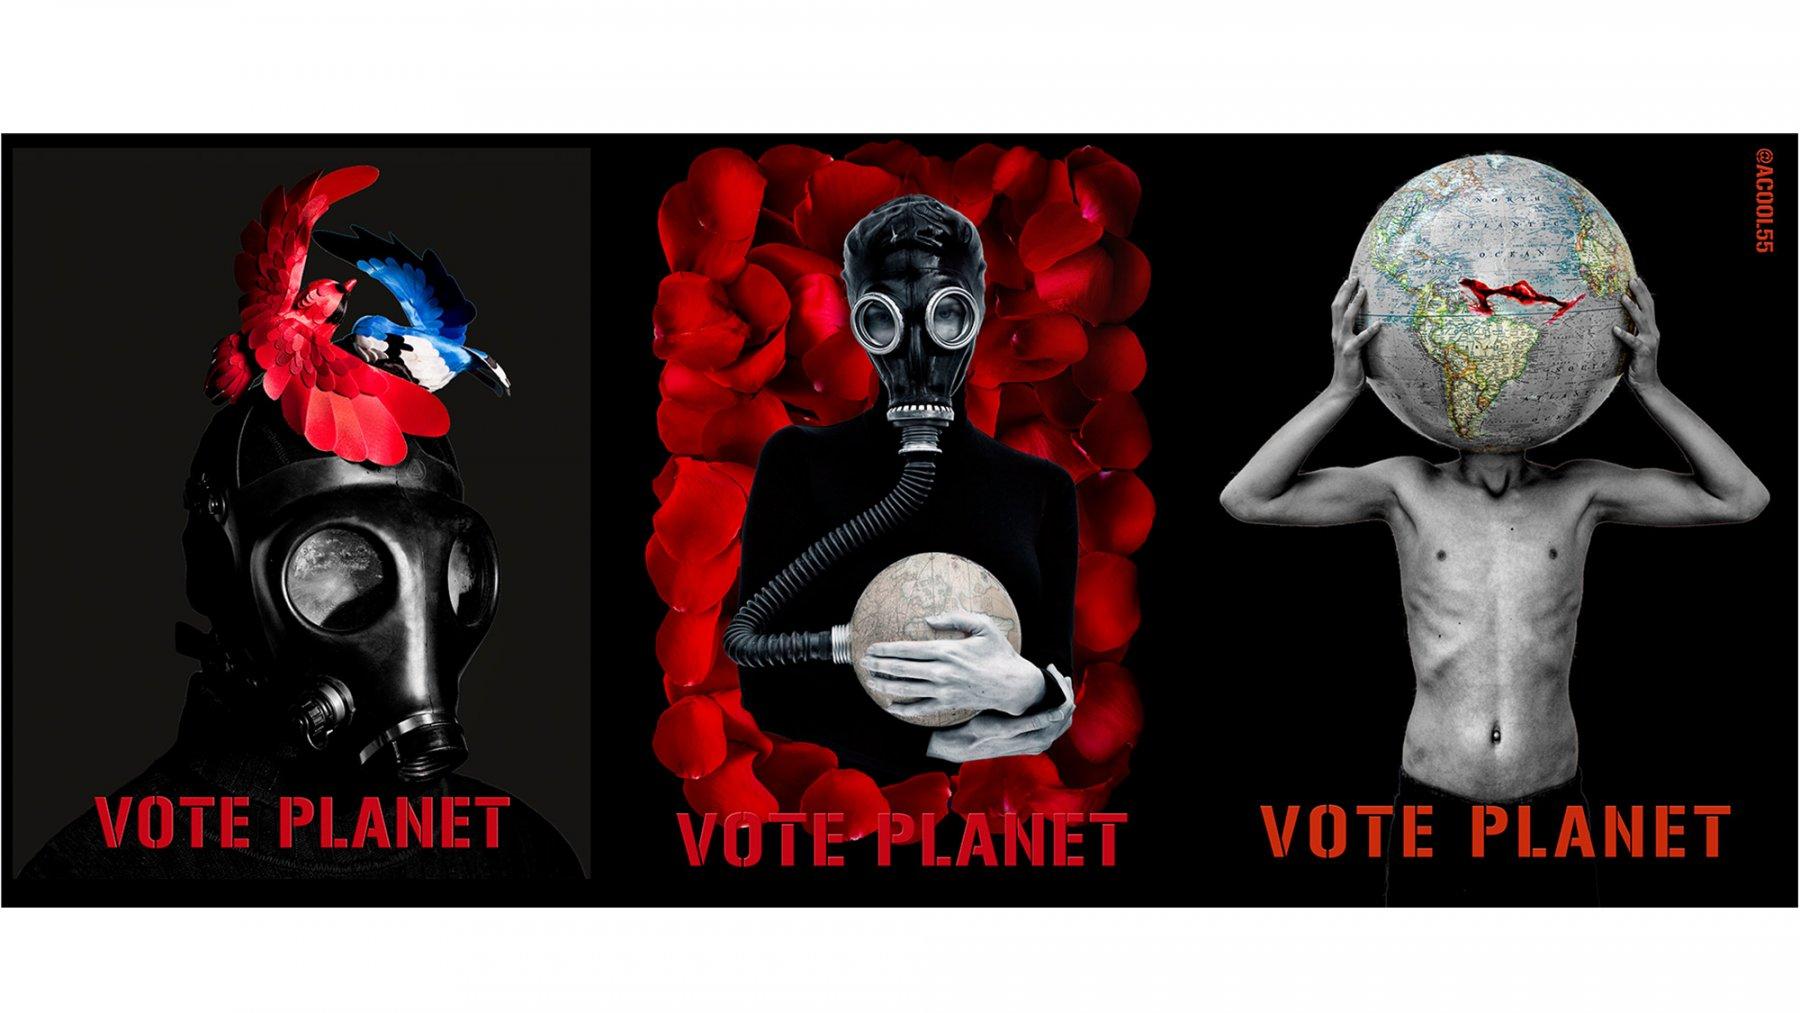 VOTE-PLANET-3